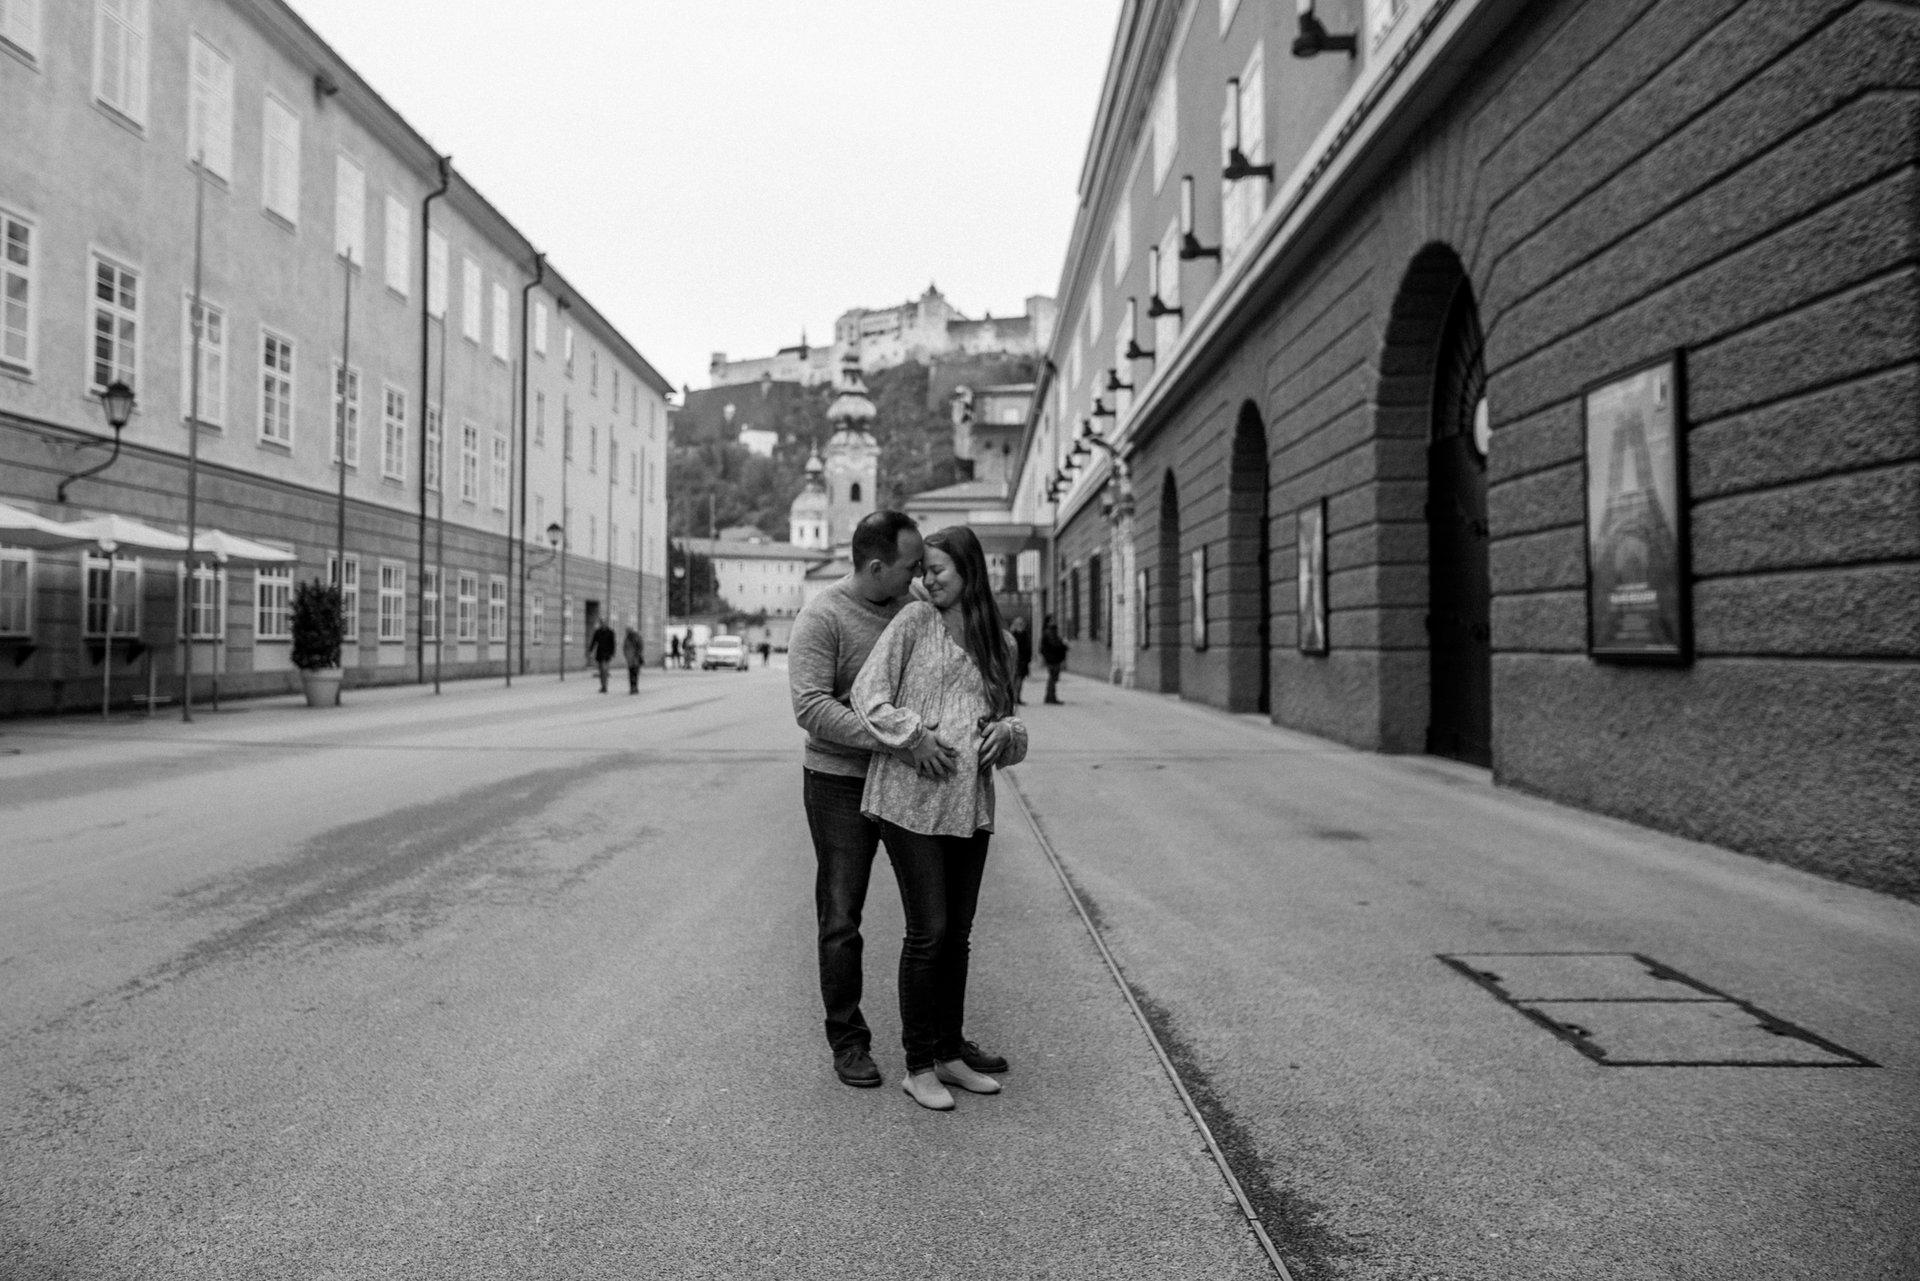 Salzburg-Austria-travel-story-Flytographer-17